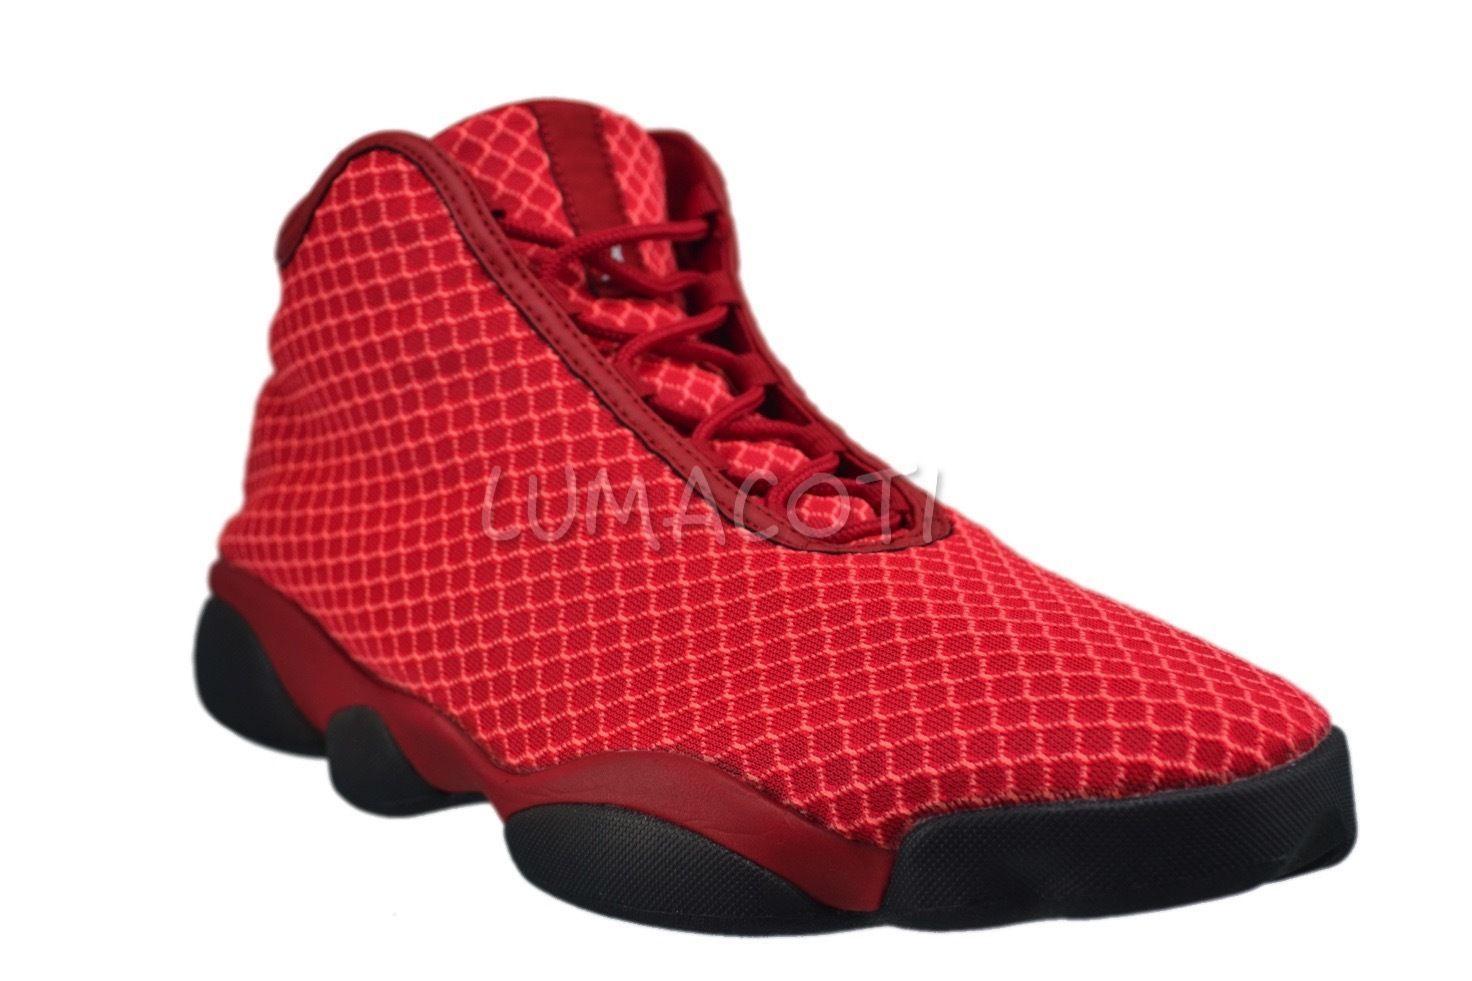 Jordan Shoes Under  Dollars